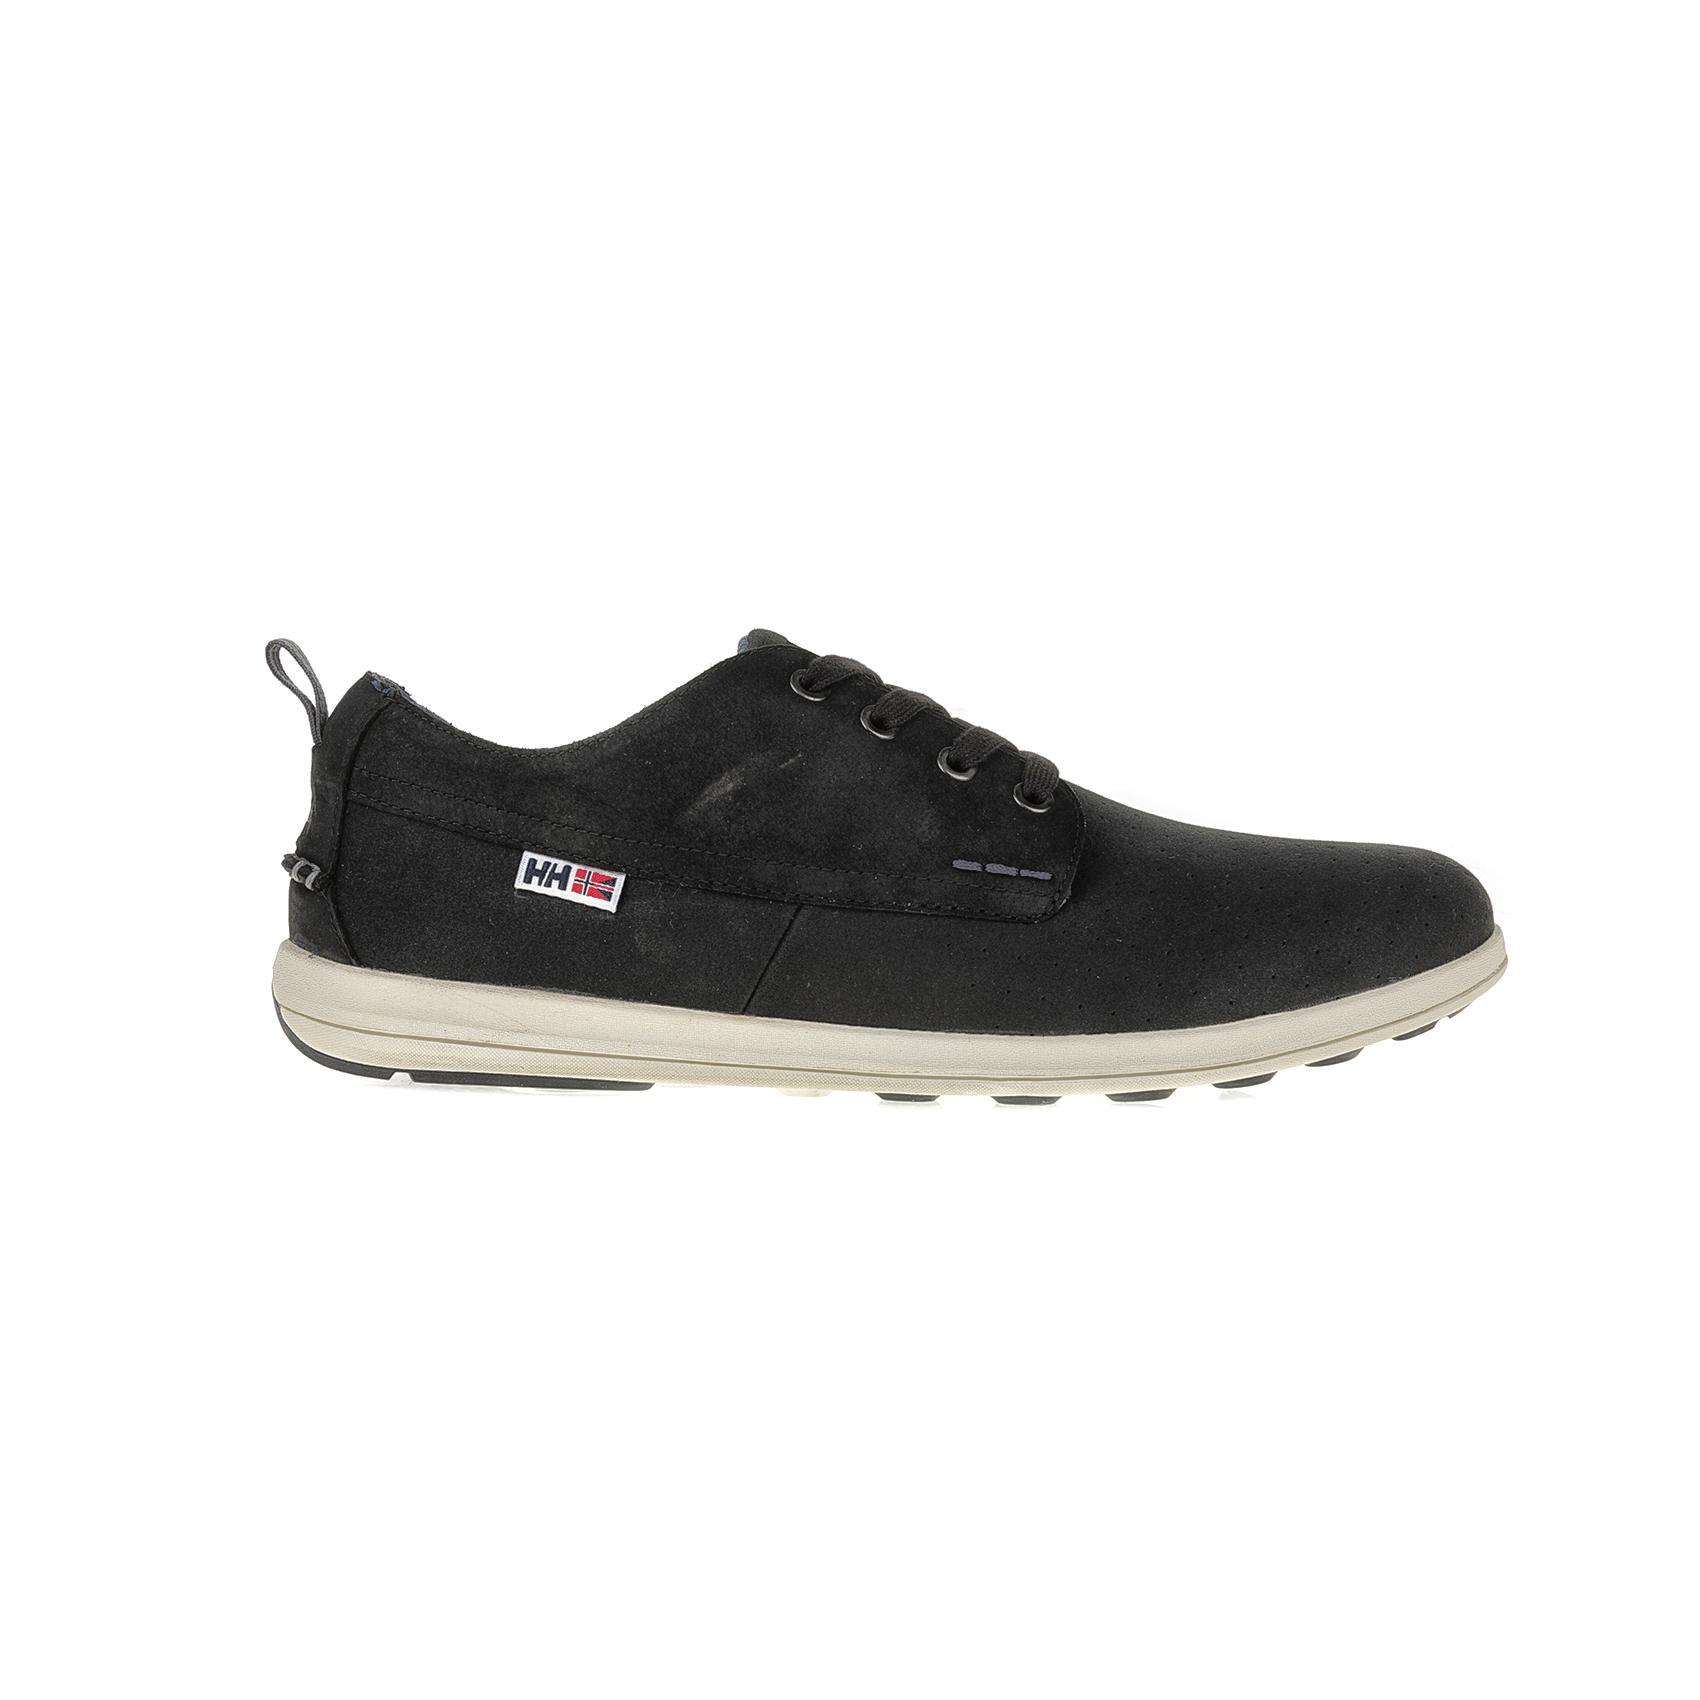 HELLY HANSEN – Ανδρικά παπούτσια HELLY HANSEN BERGSHAVEN μαύρα